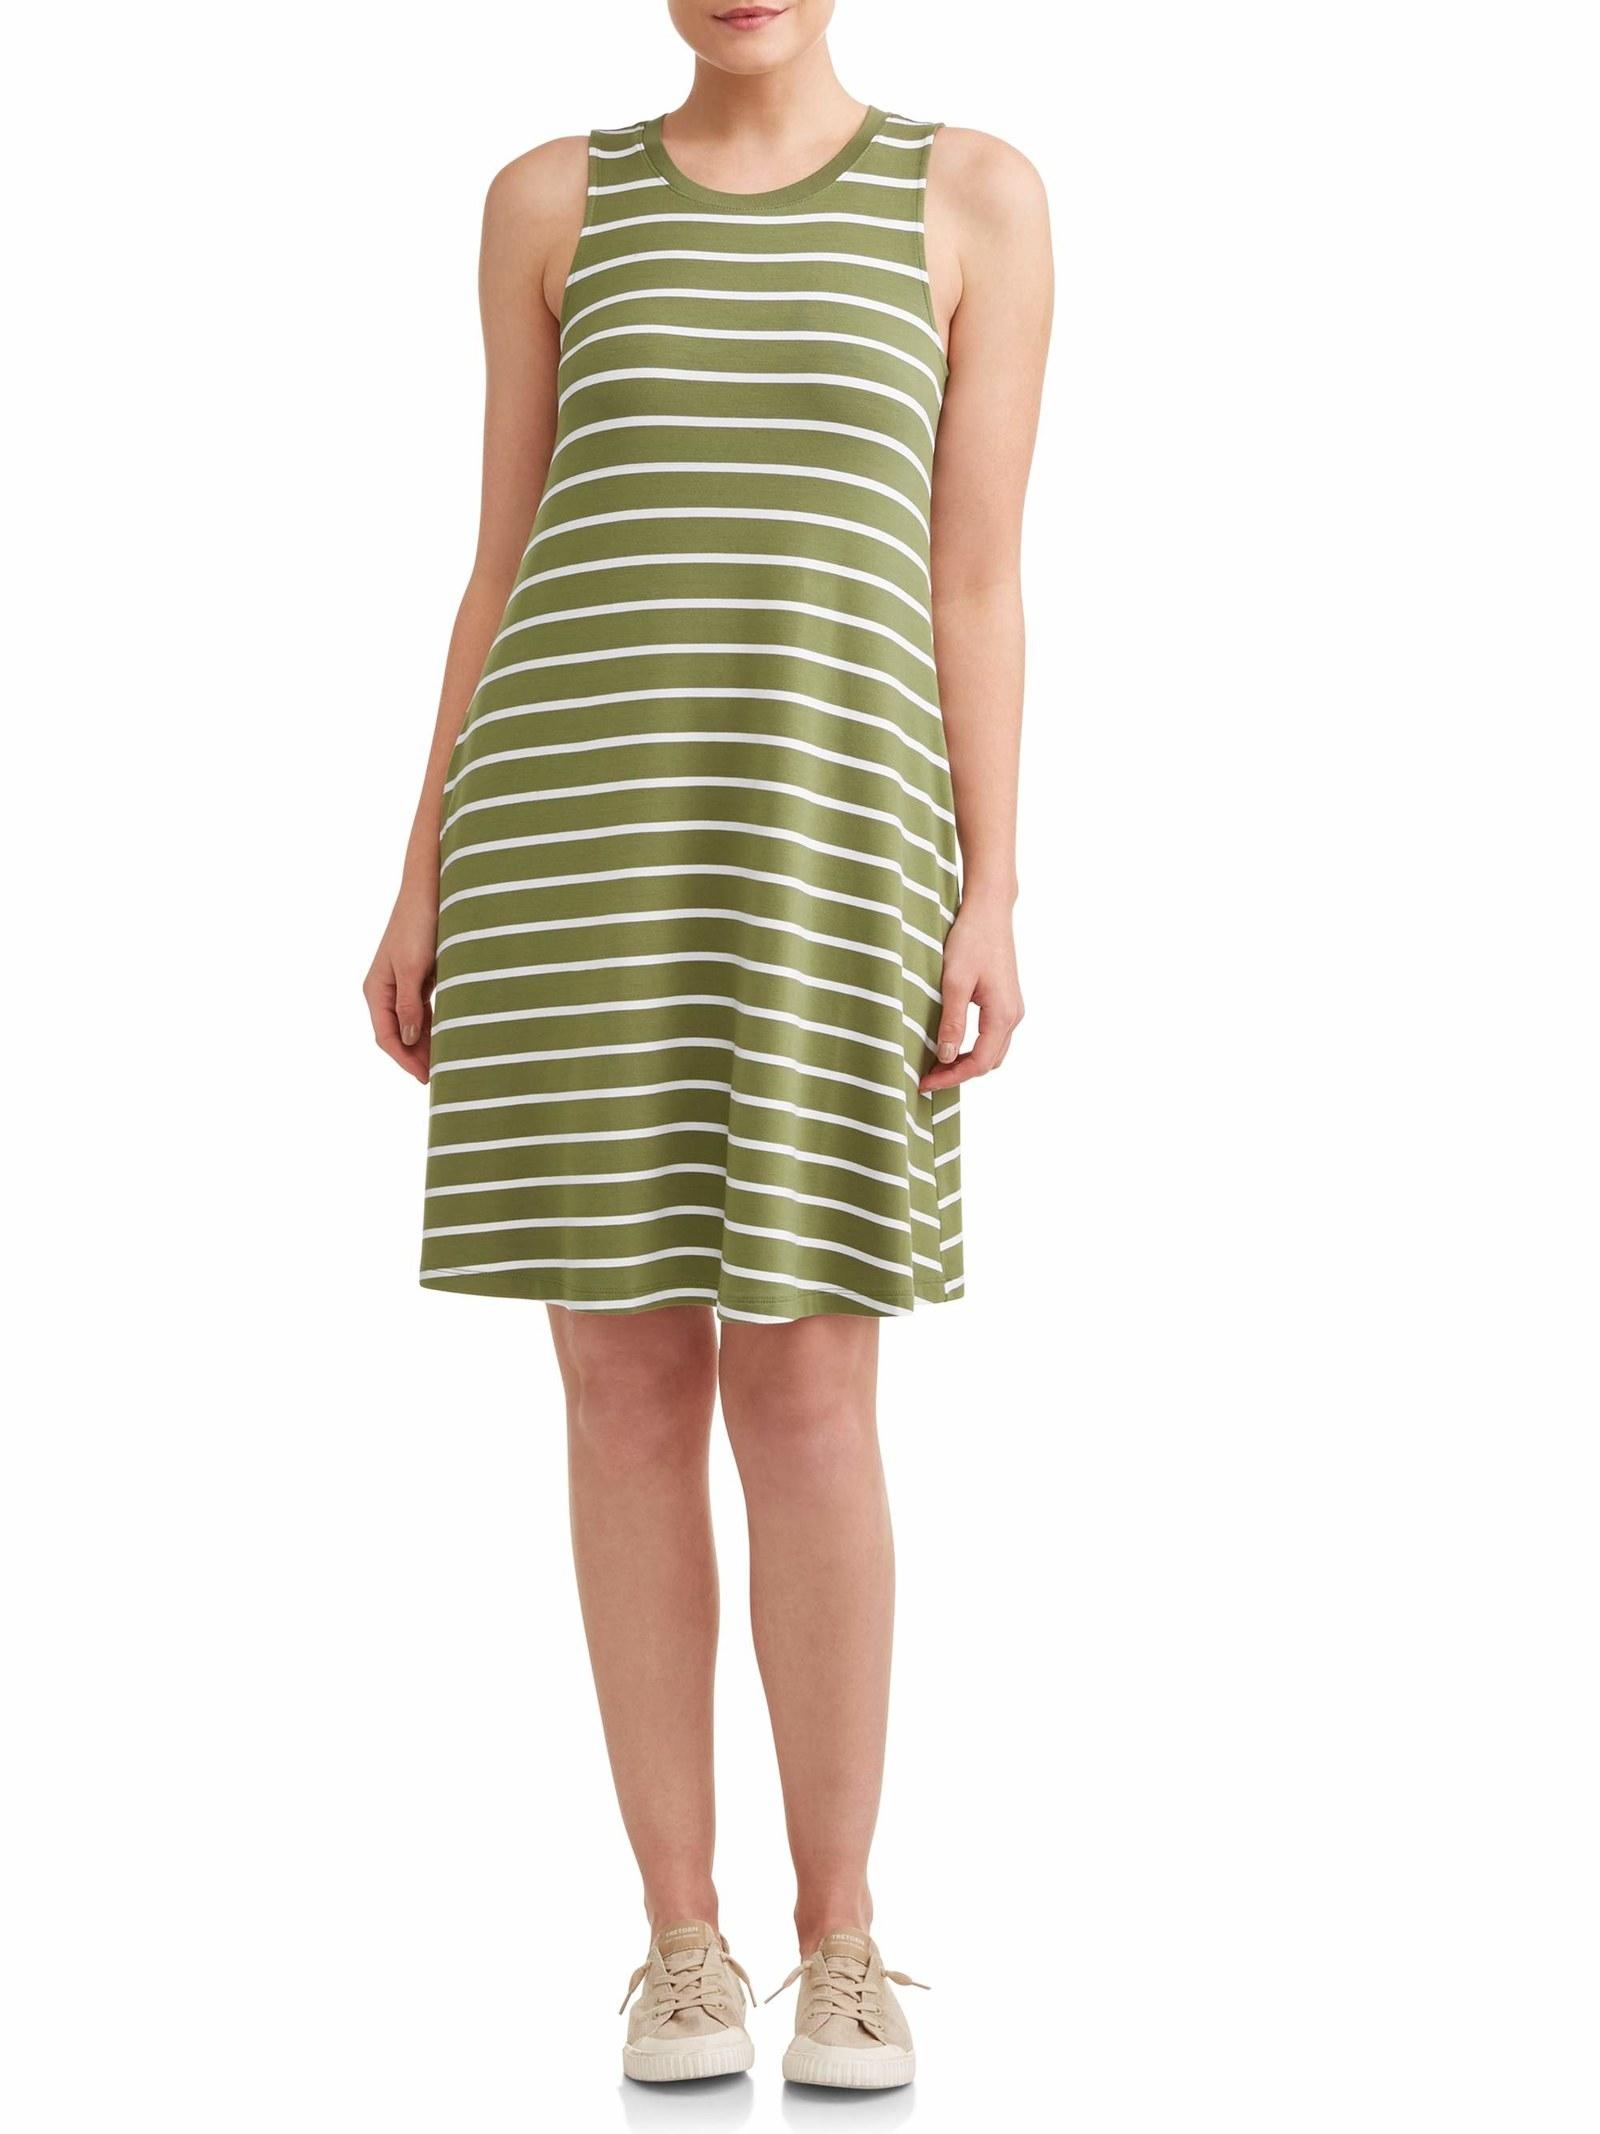 Plus Size Summer Dresses At Walmart - raveitsafe